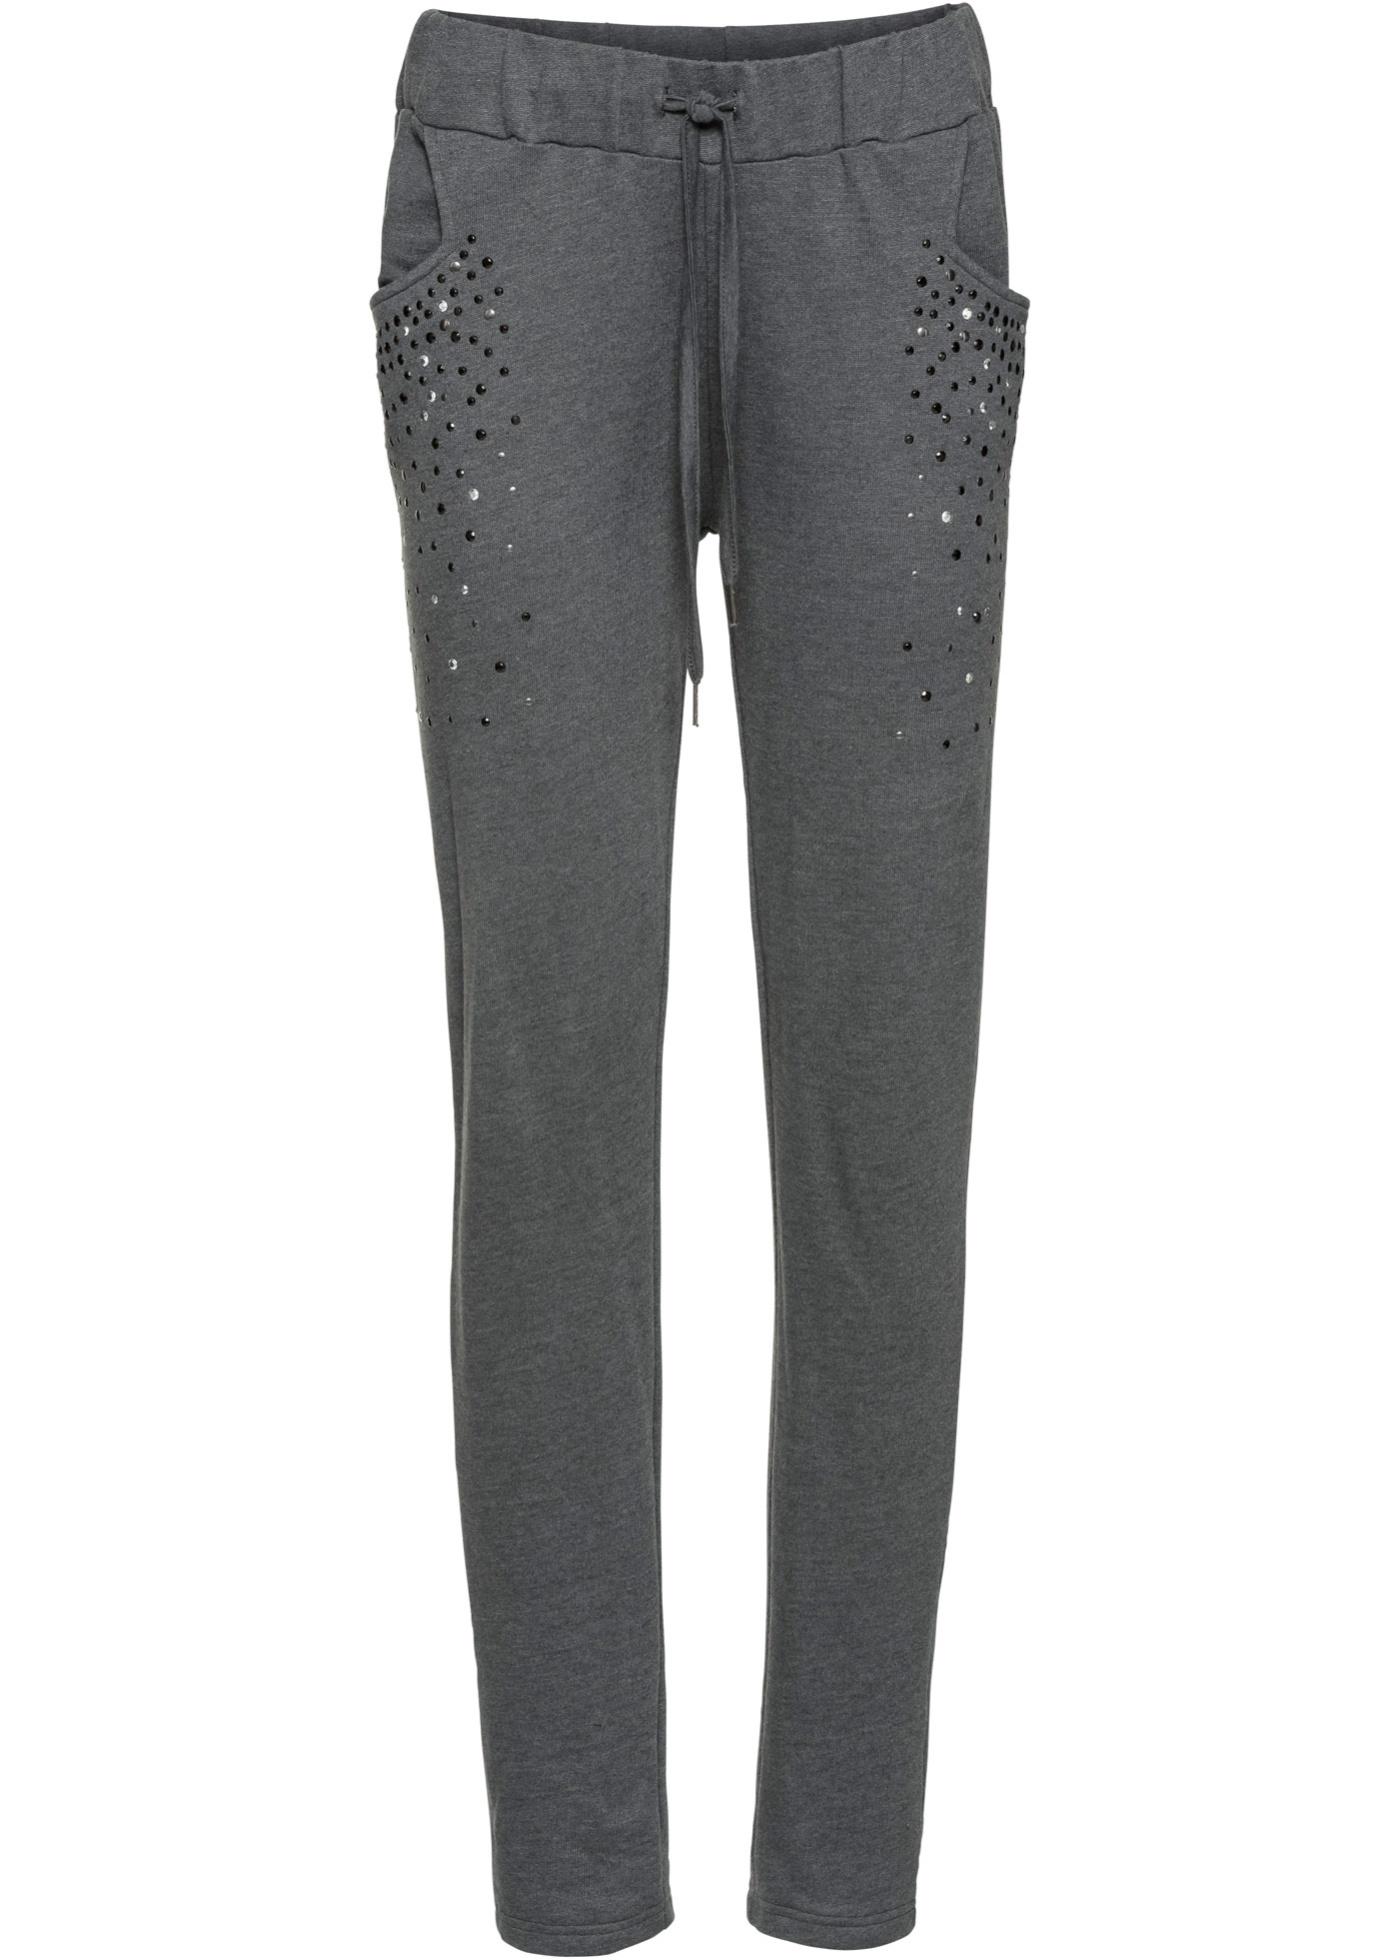 Pantalon sweat avec rivets